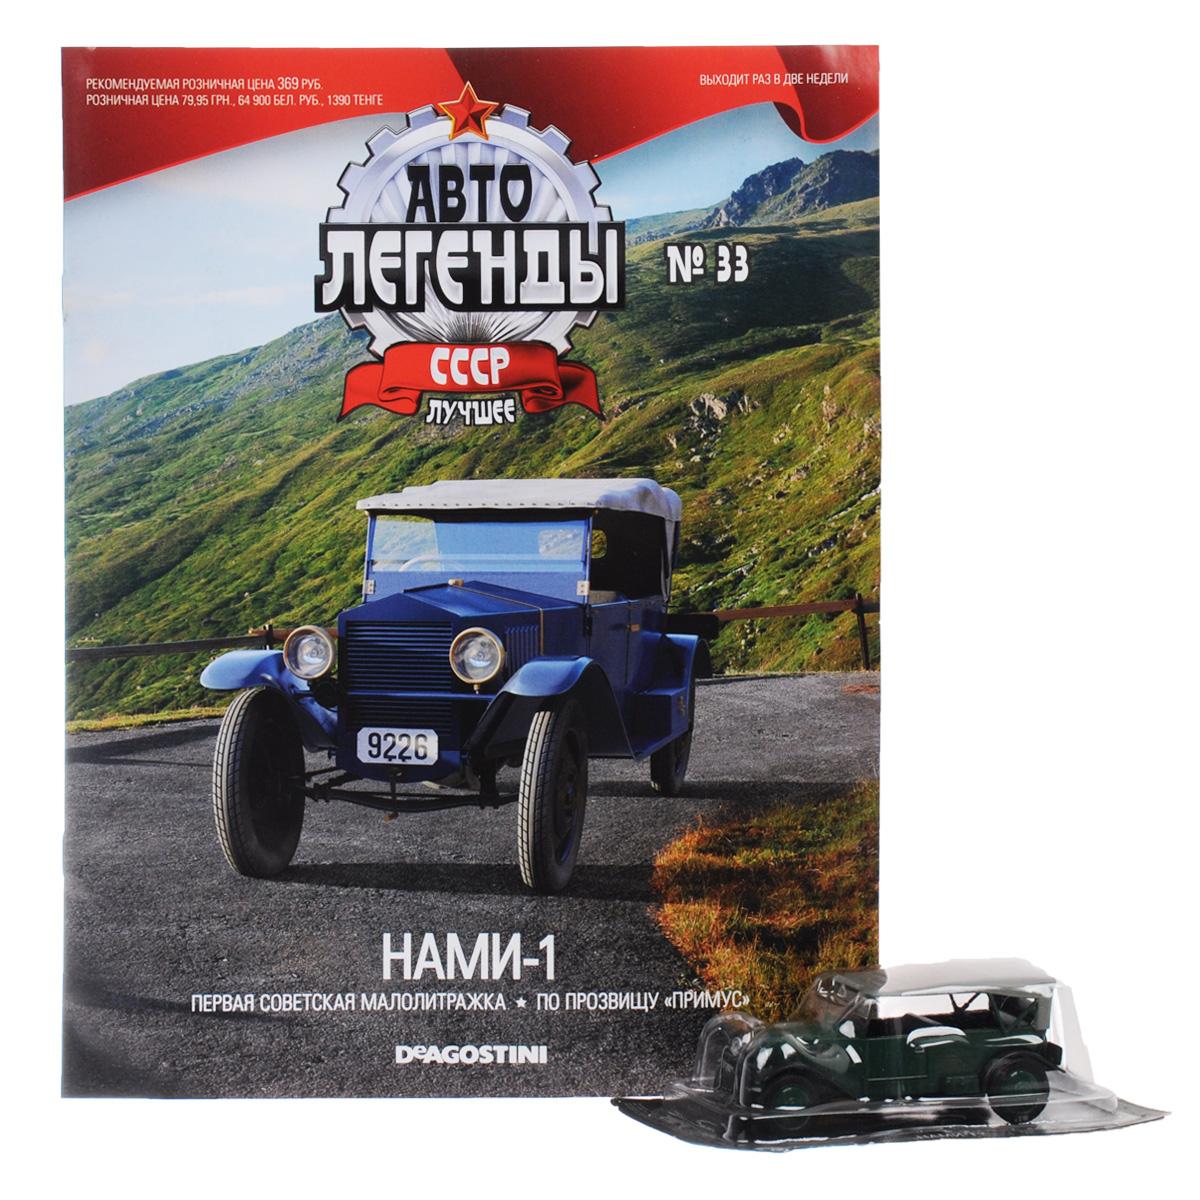 Журнал Авто легенды СССР №33